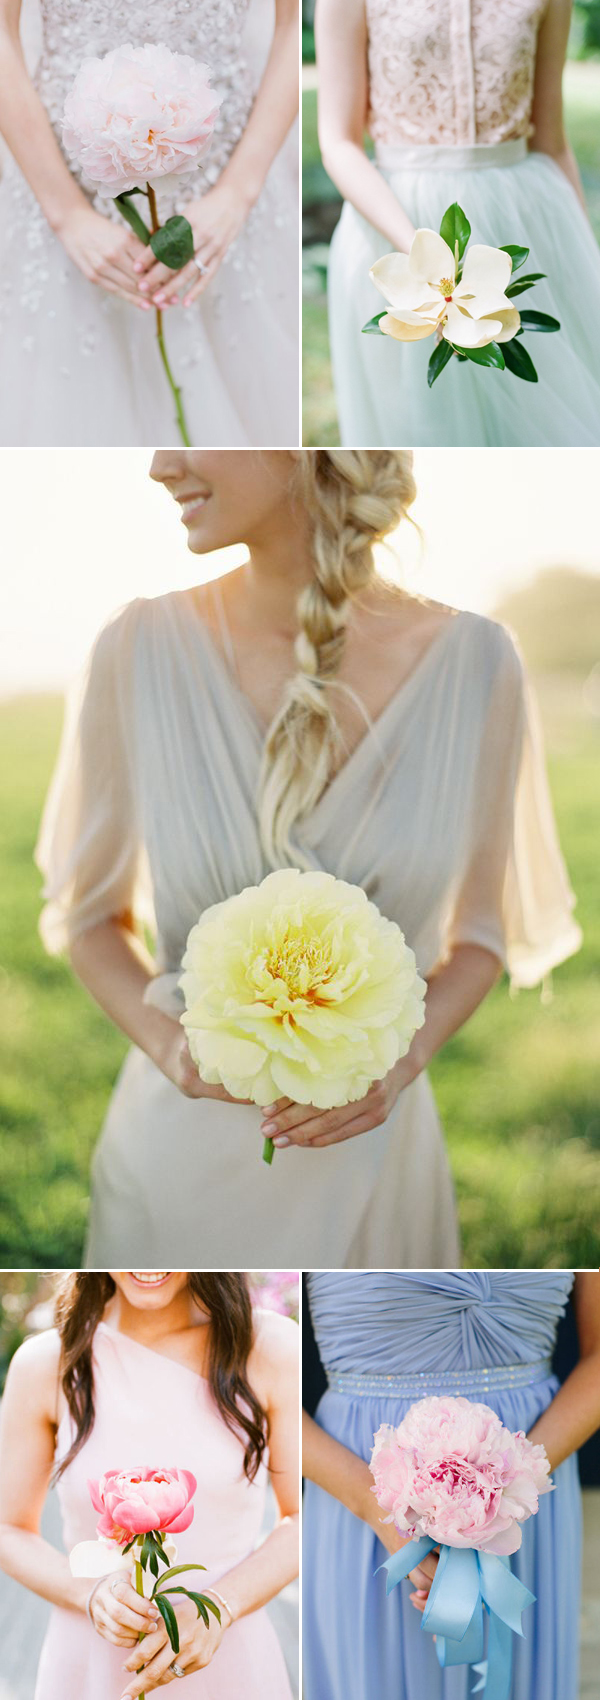 bridesmaid-bouquet03-single